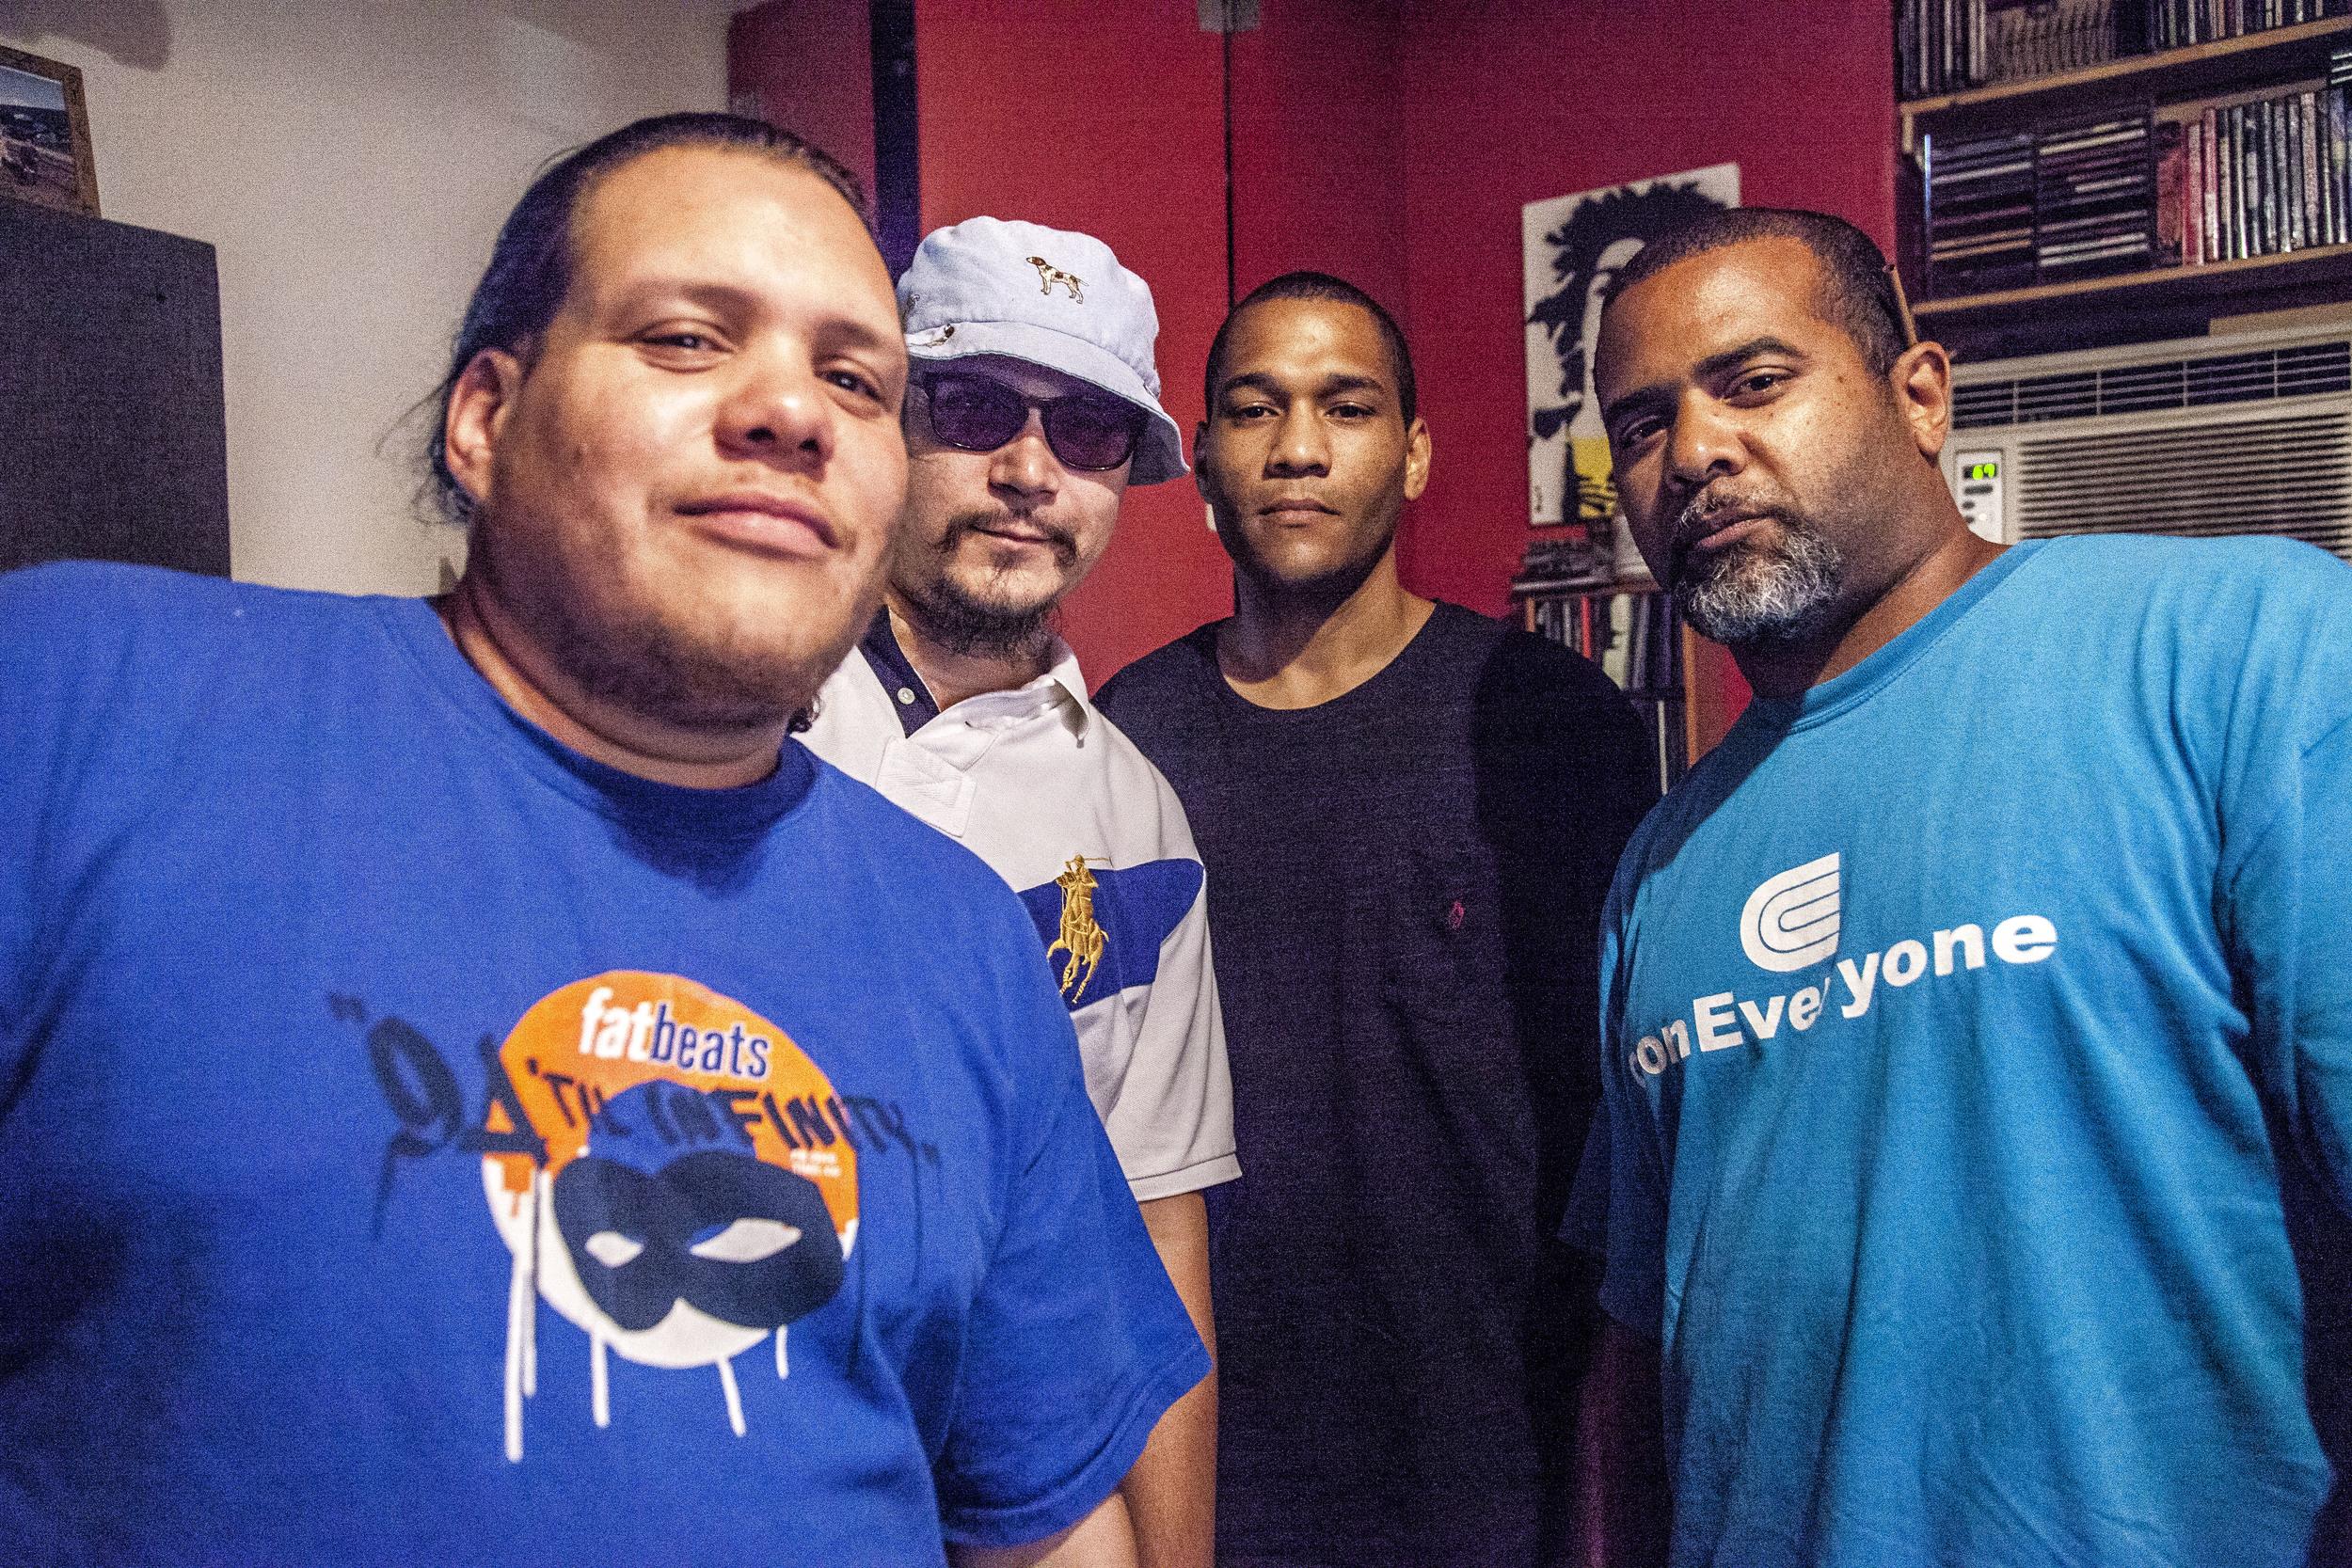 Guerrilla Grooves Radio. Rhinoceros Funk, Julz Money, Miggz & DJ FredOnes. TME Pro Studios. Bronx, NYC. August 2015.